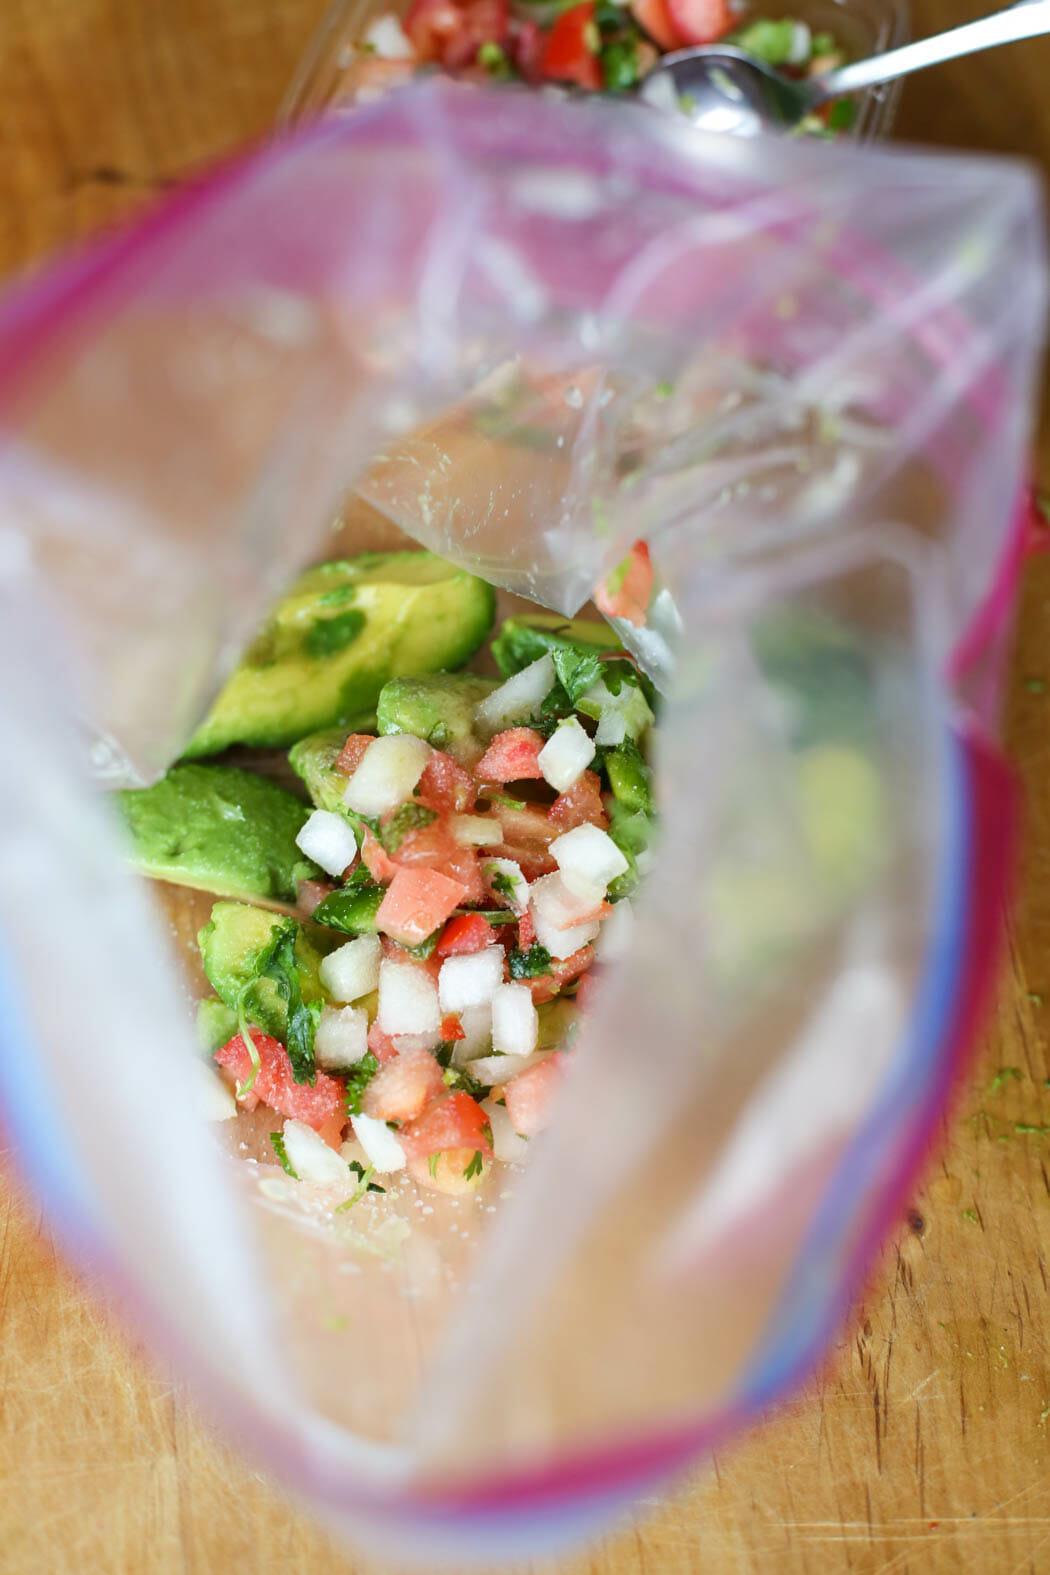 Guacamole ingredients in bag